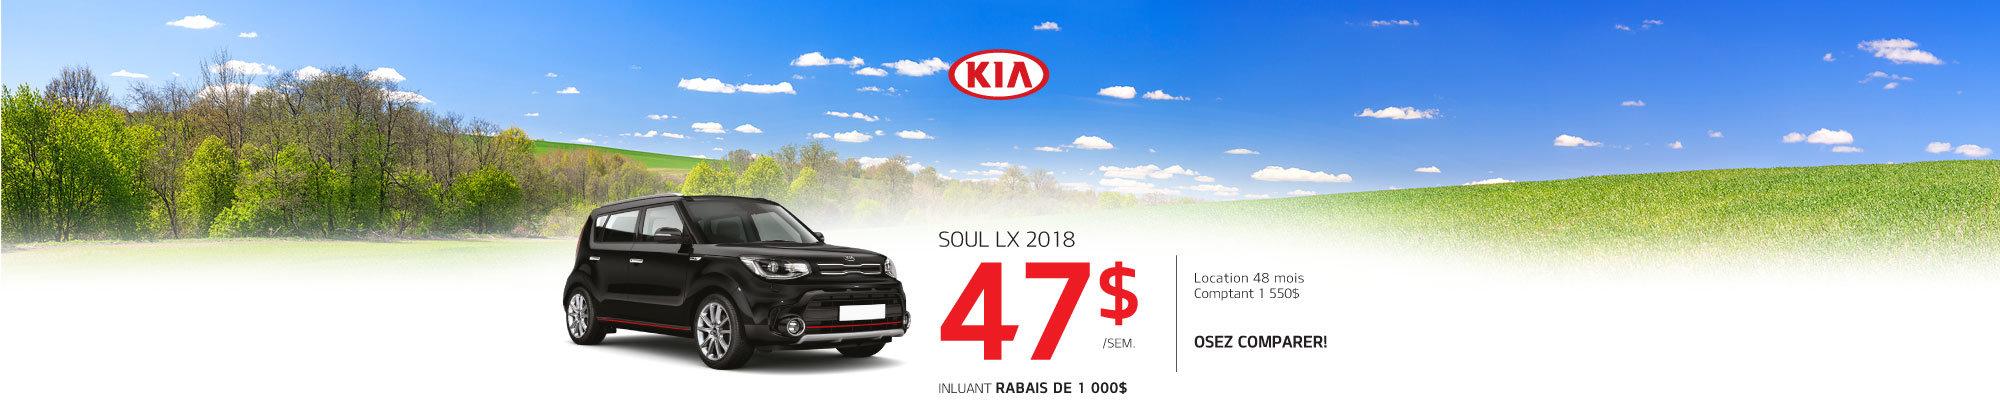 Soul LX 2018 à prix incroyable! web